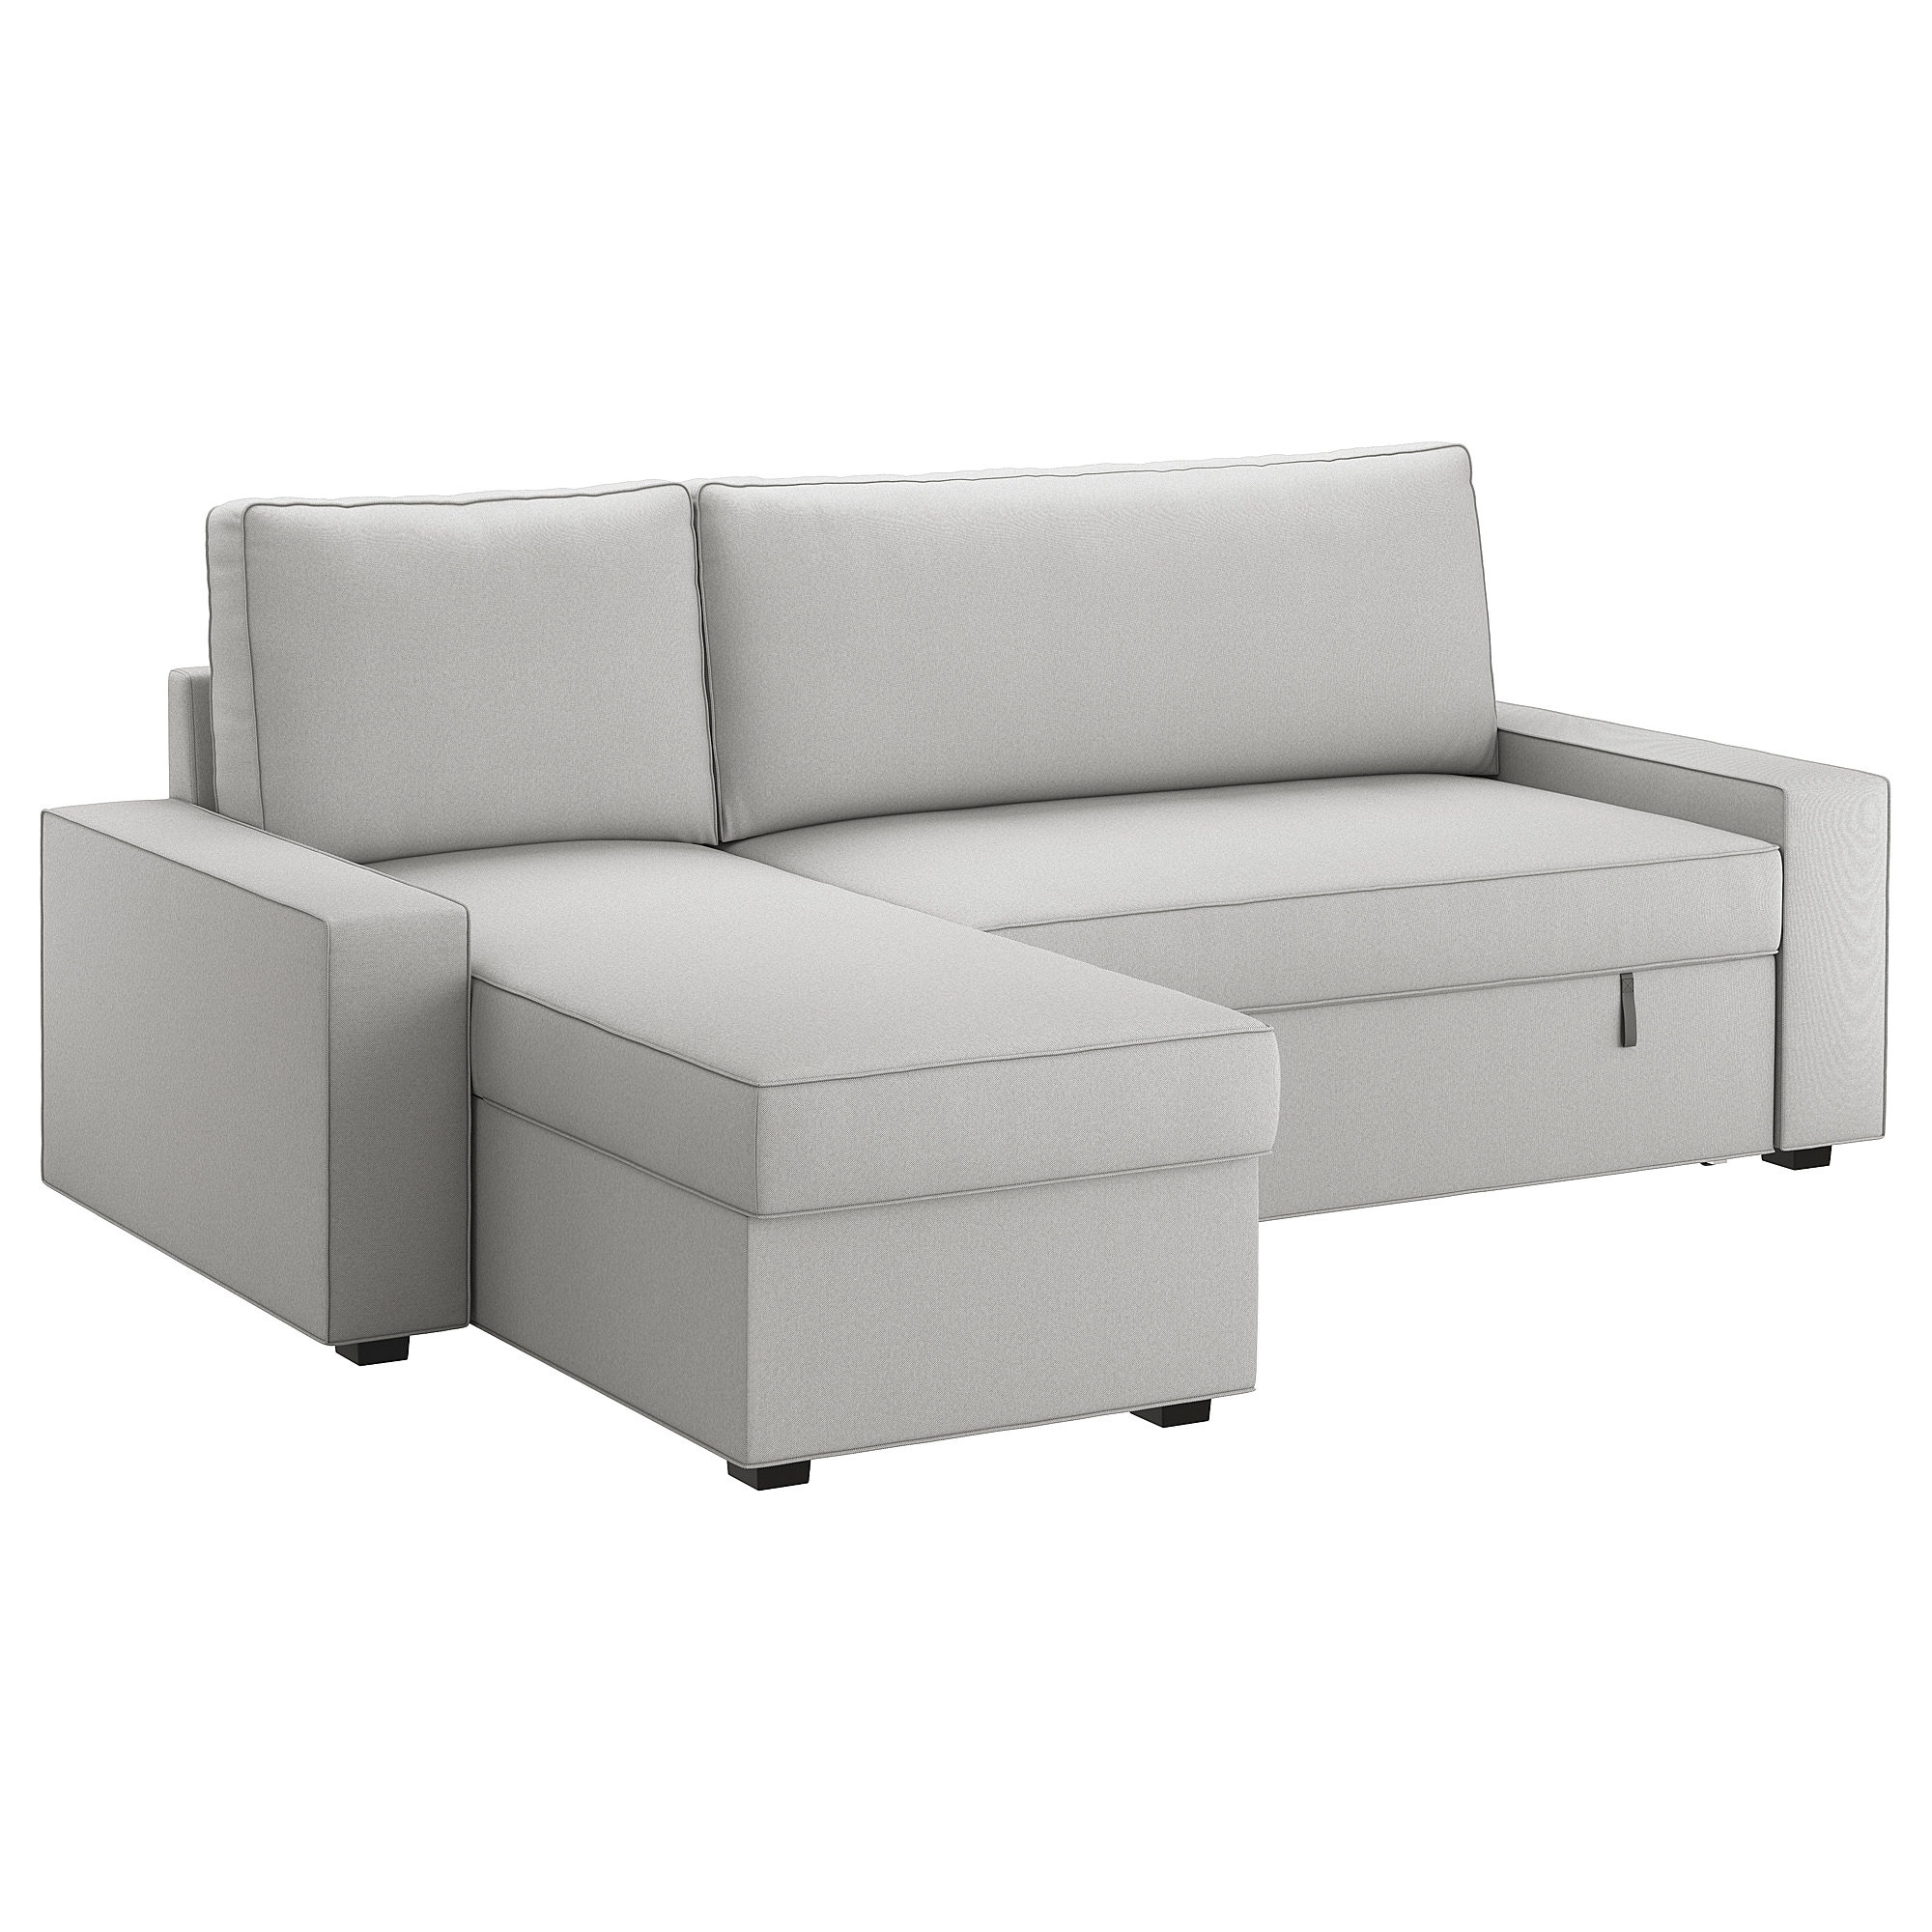 Sofas Cama Chaise Longue Etdg Vilasund sofà Cama Con Chaiselongue orrsta Gris Claro Ikea